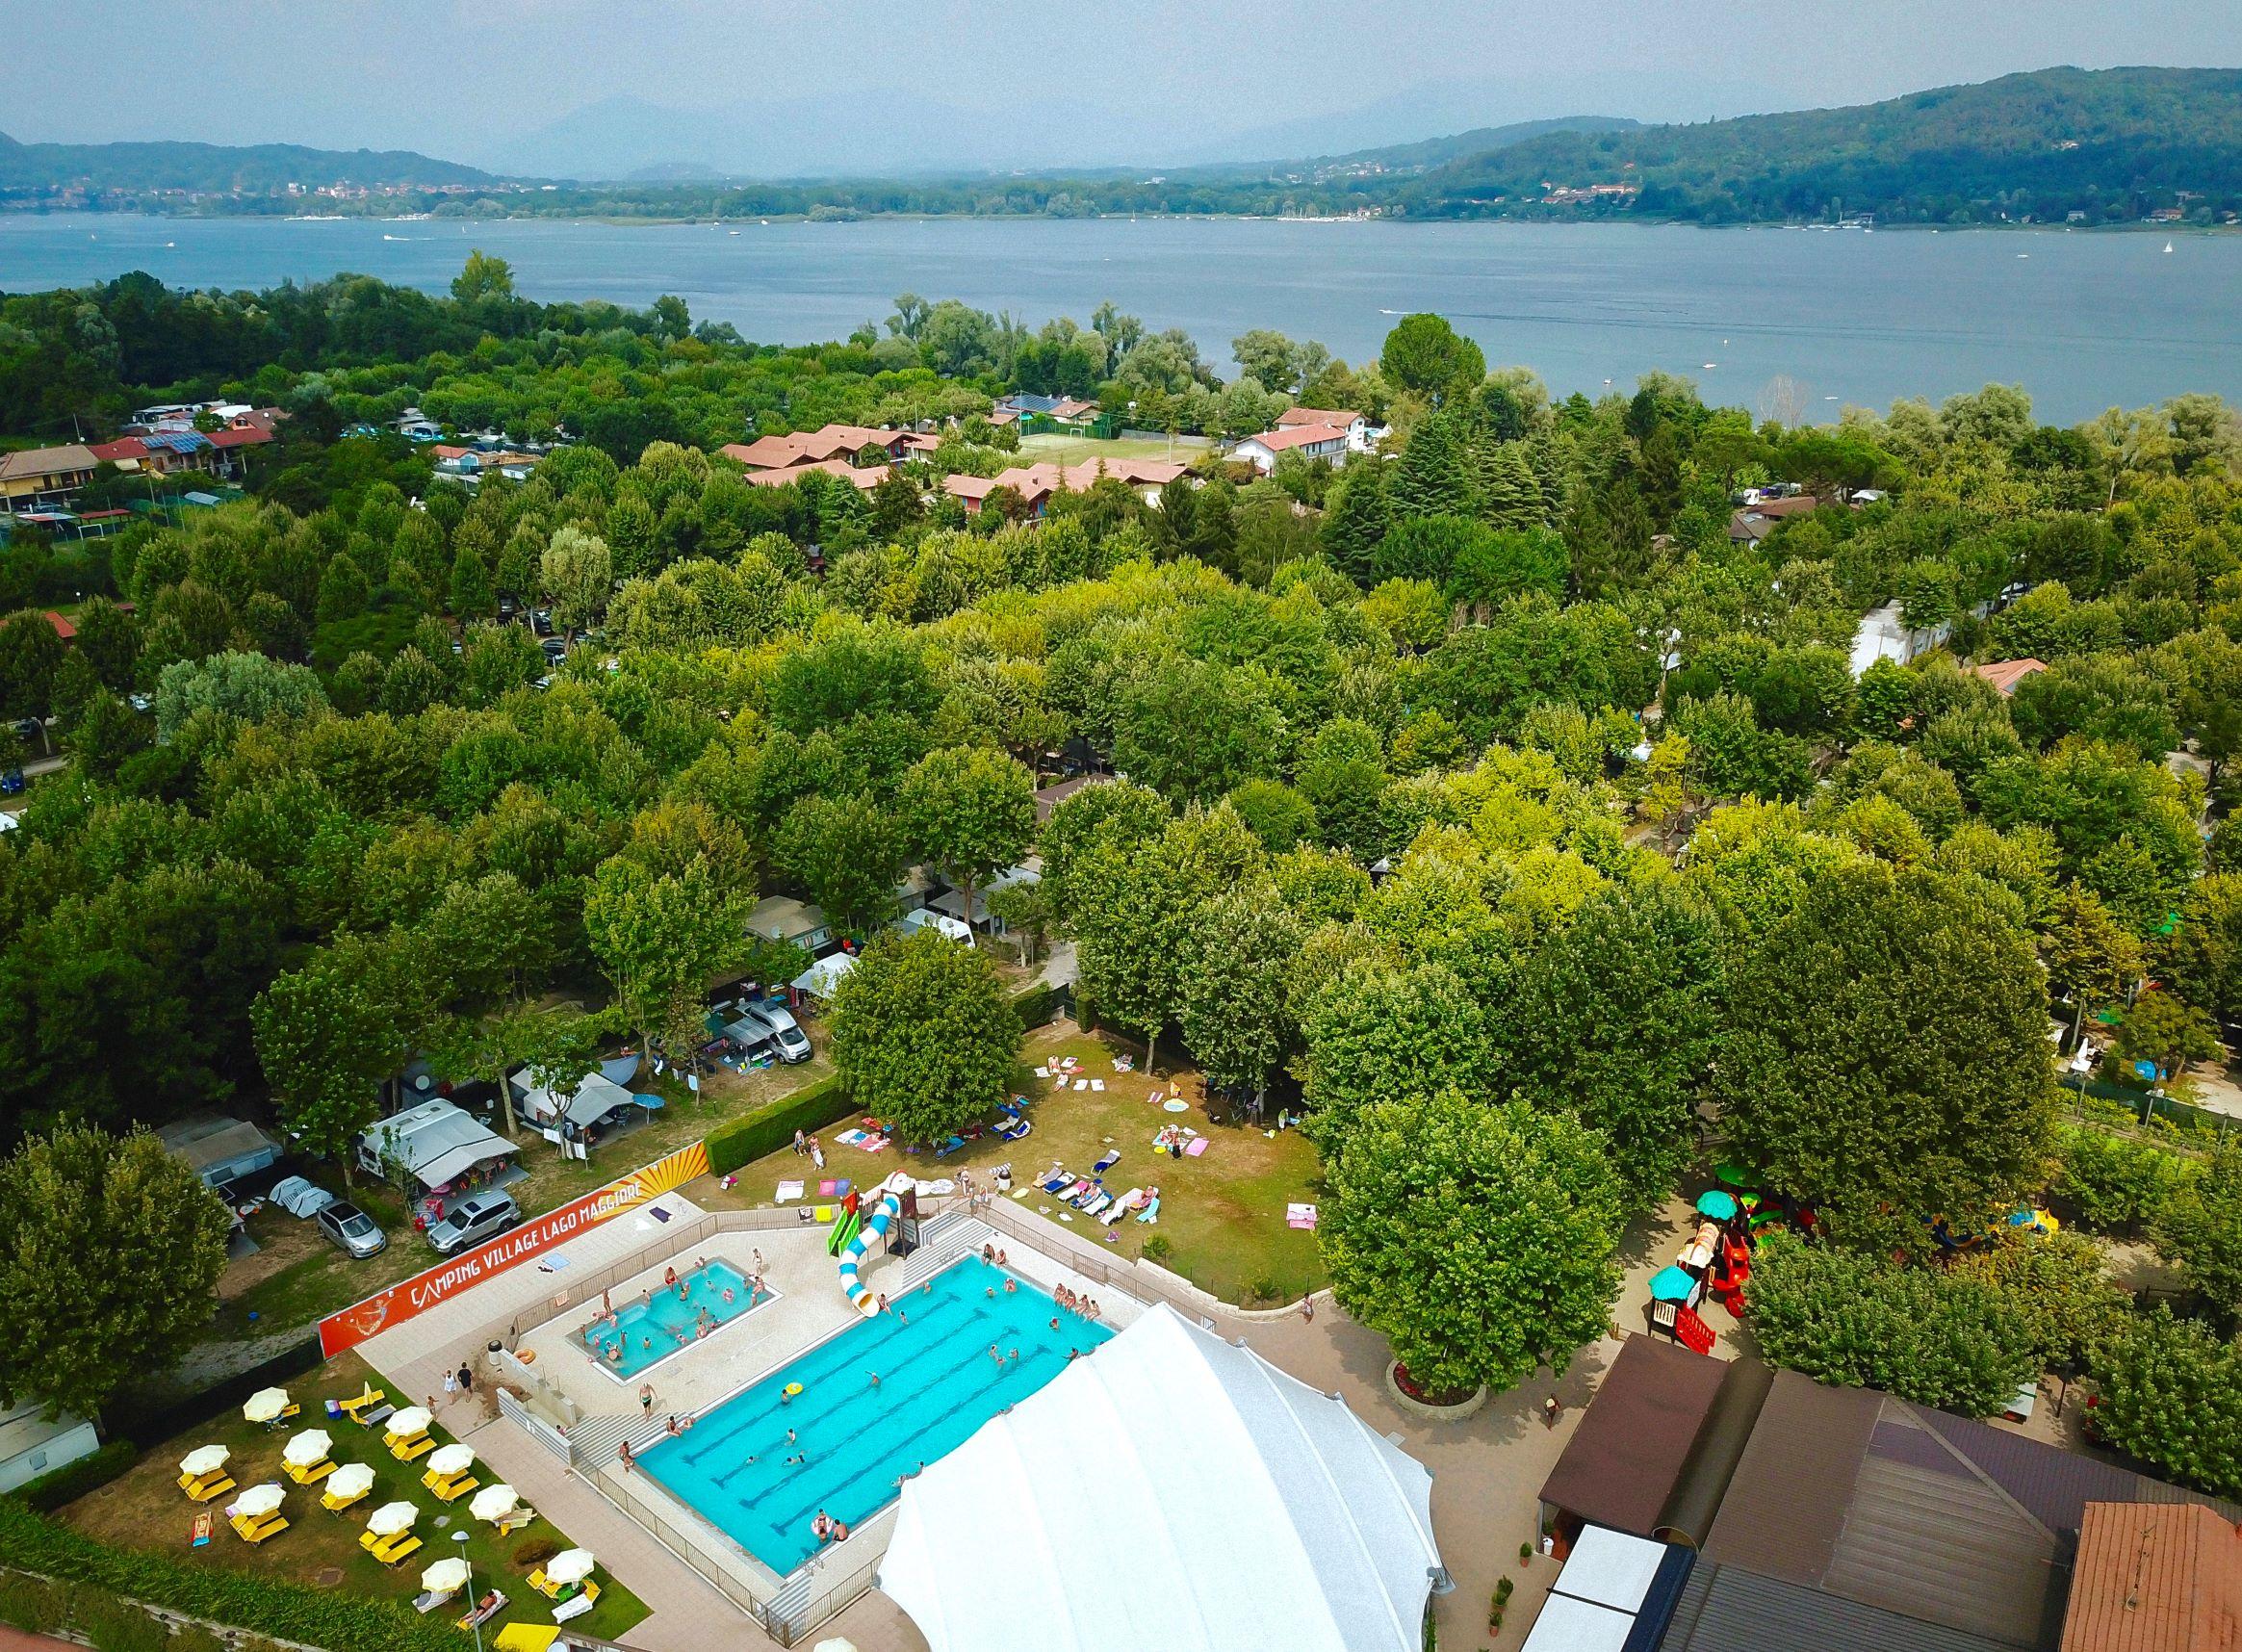 Mobilheim Kaufen Lago Maggiore : Camping lago maggiore: jetzt günstig buchen! selectcamp.com